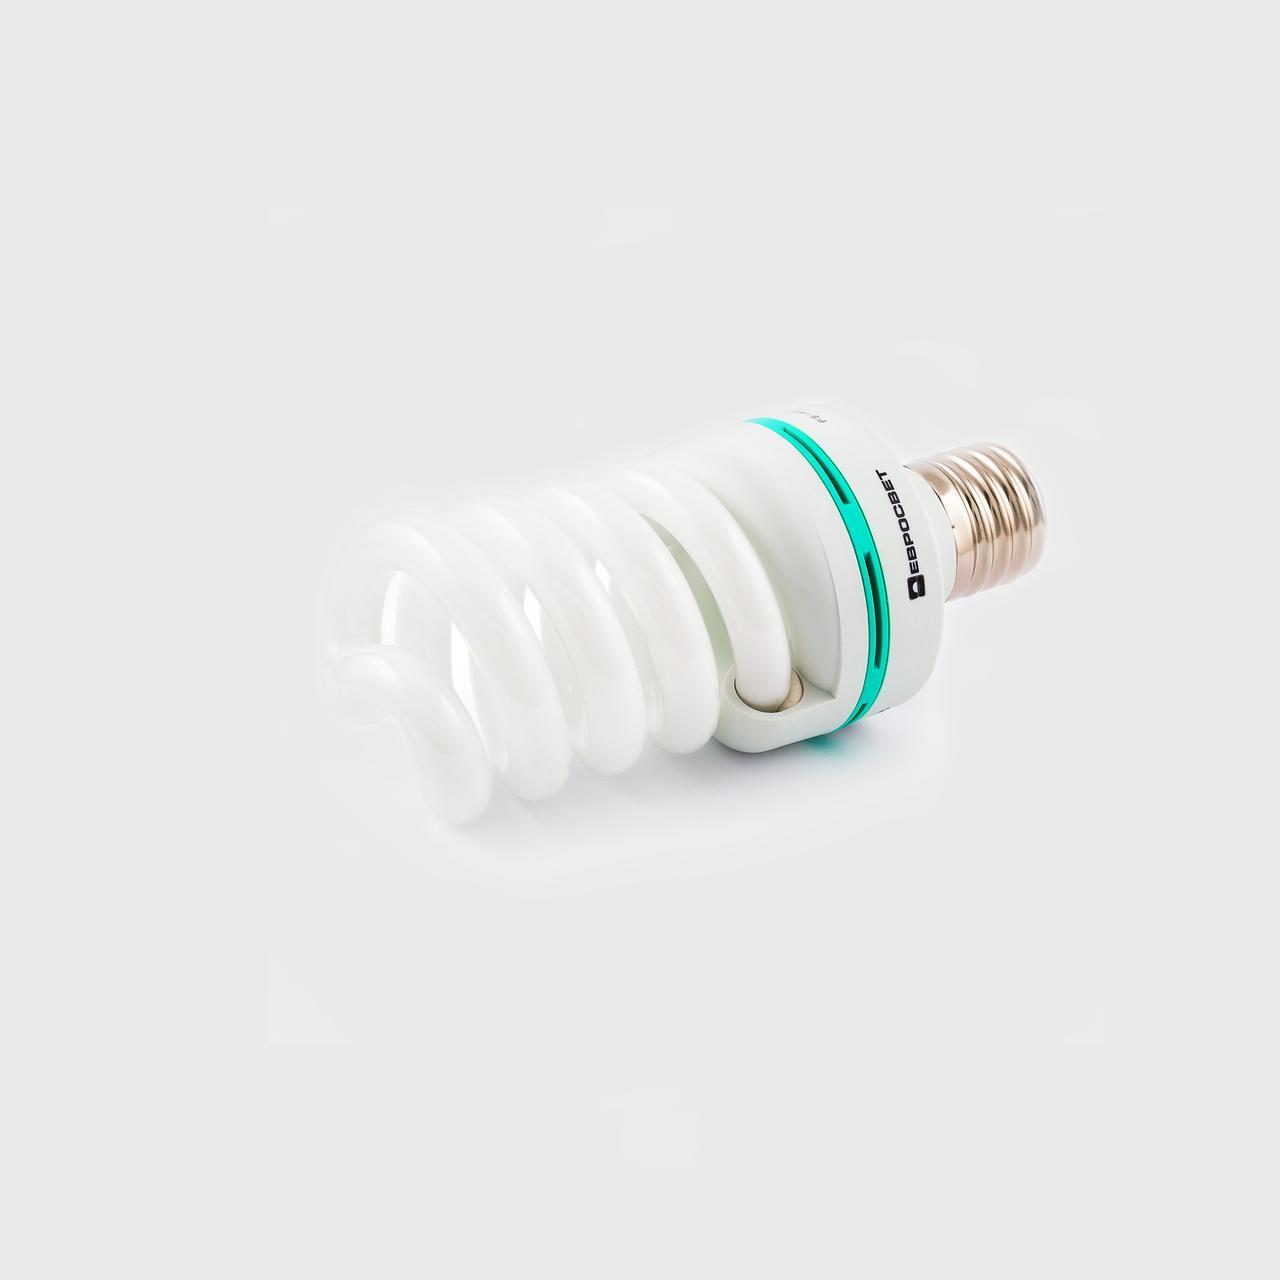 Лампа энергосберегающая 45W E27 4200K U-45-4200-27